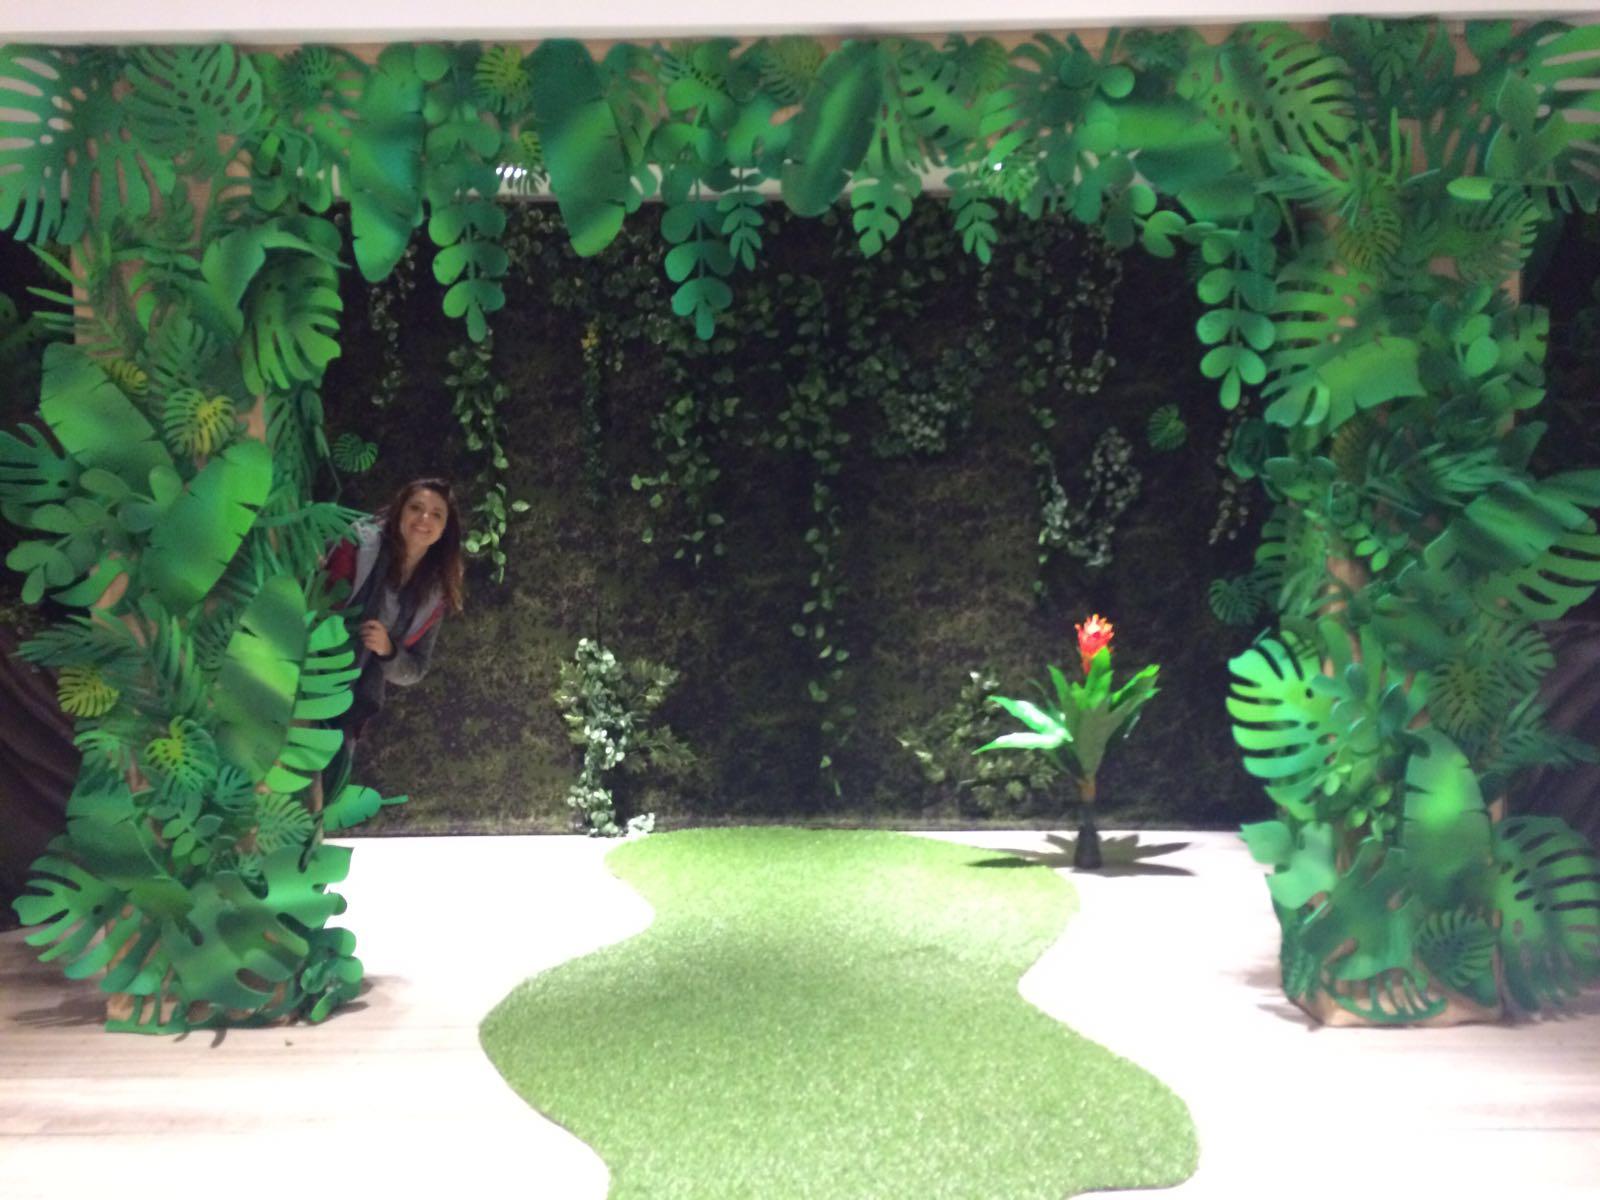 inchiriere decor petrecere tematica jungla, exotic, photo corner vara